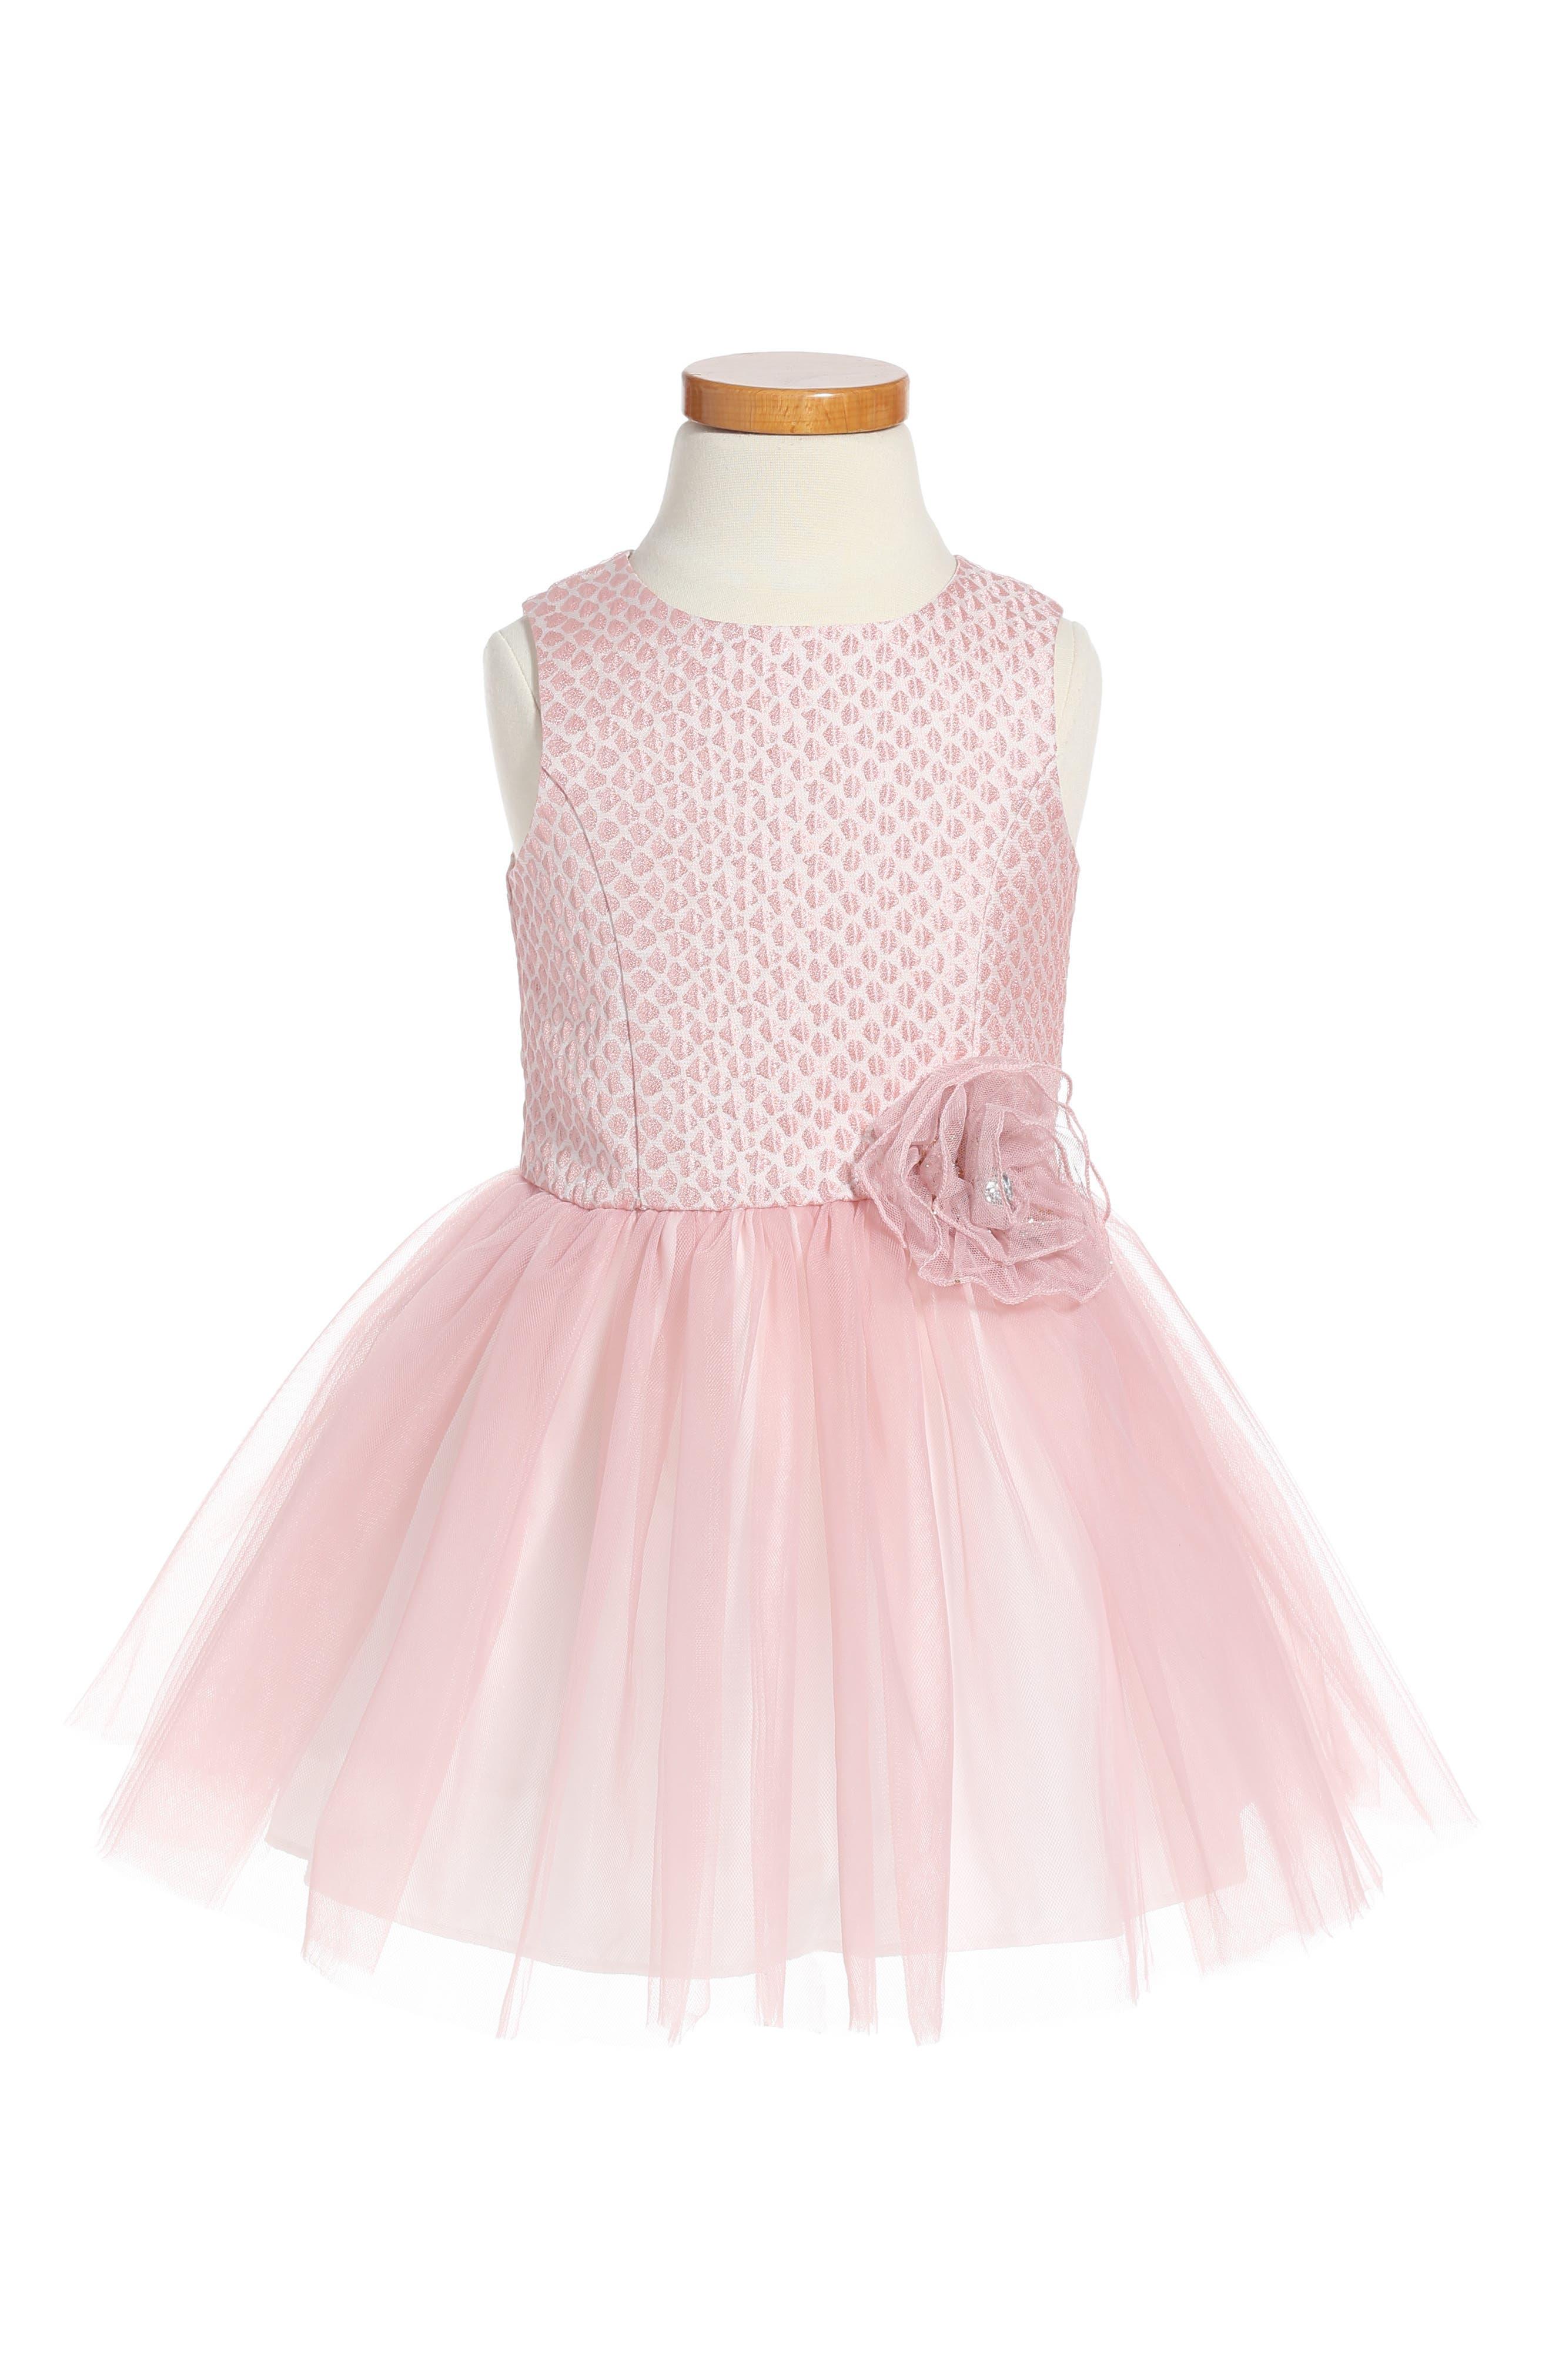 Main Image - Pippa & Julie Brocade & Tulle Dress (Toddler Girls & Little Girls)